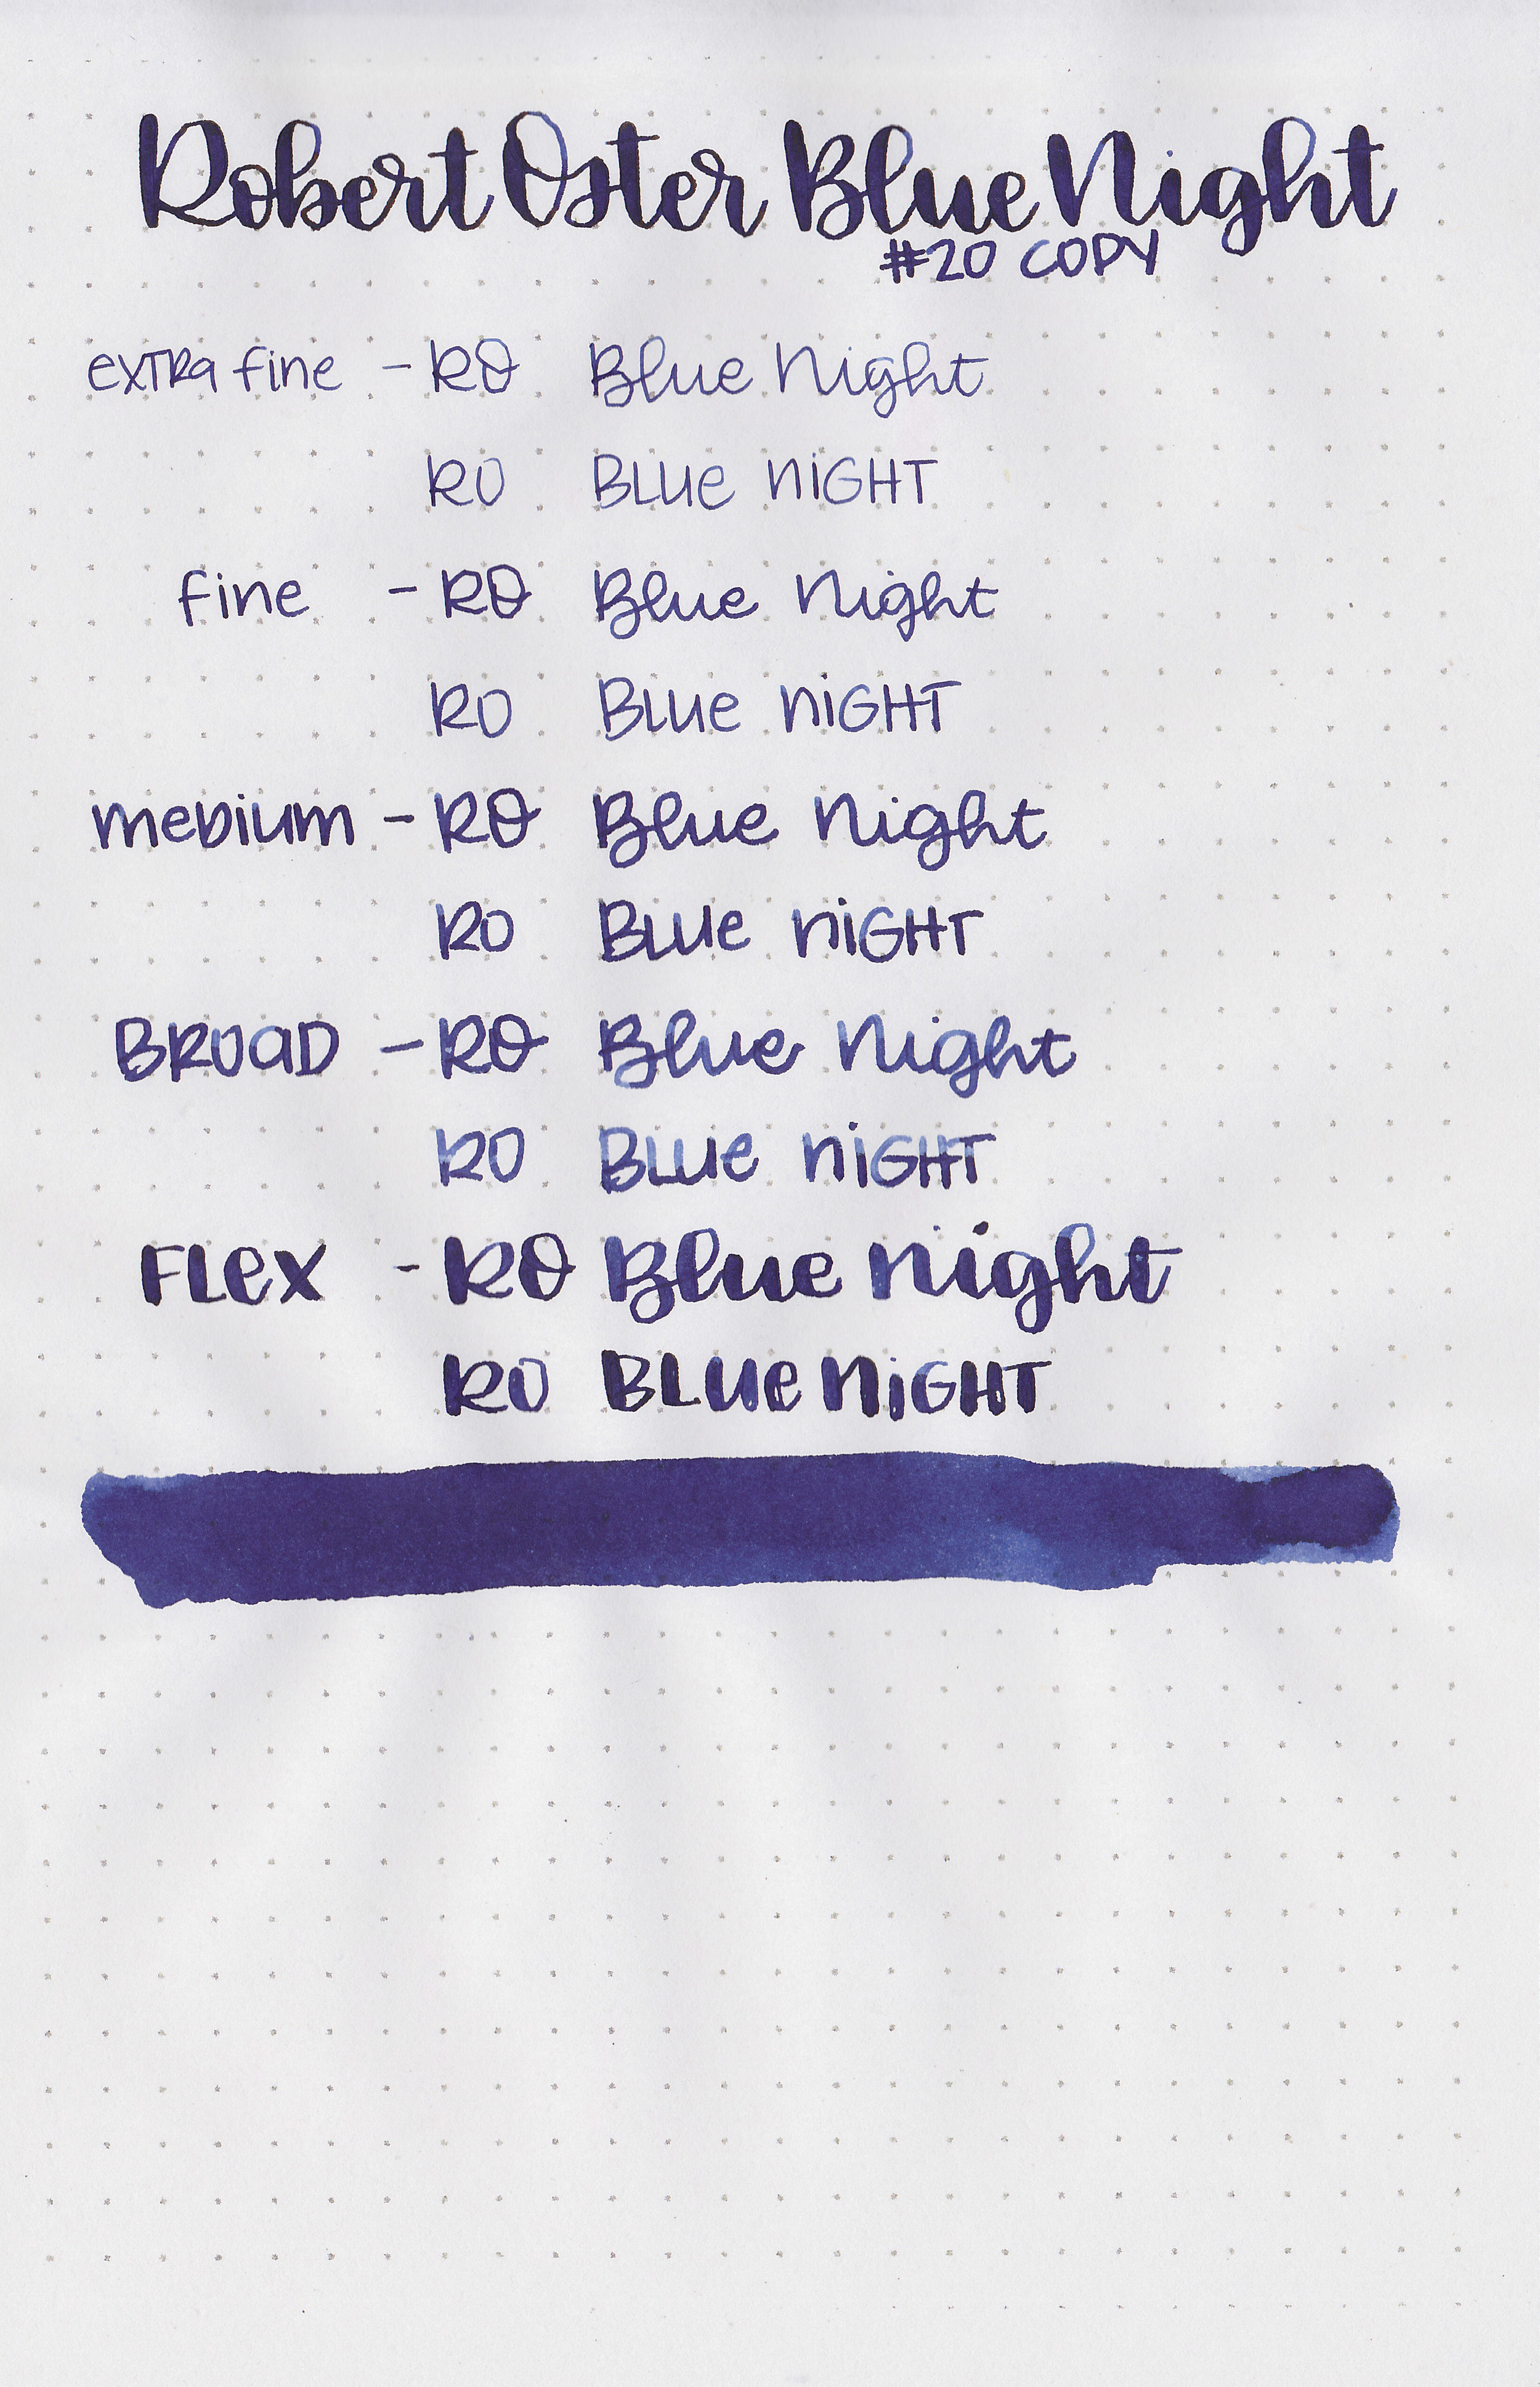 ro-blue-night-12.jpg